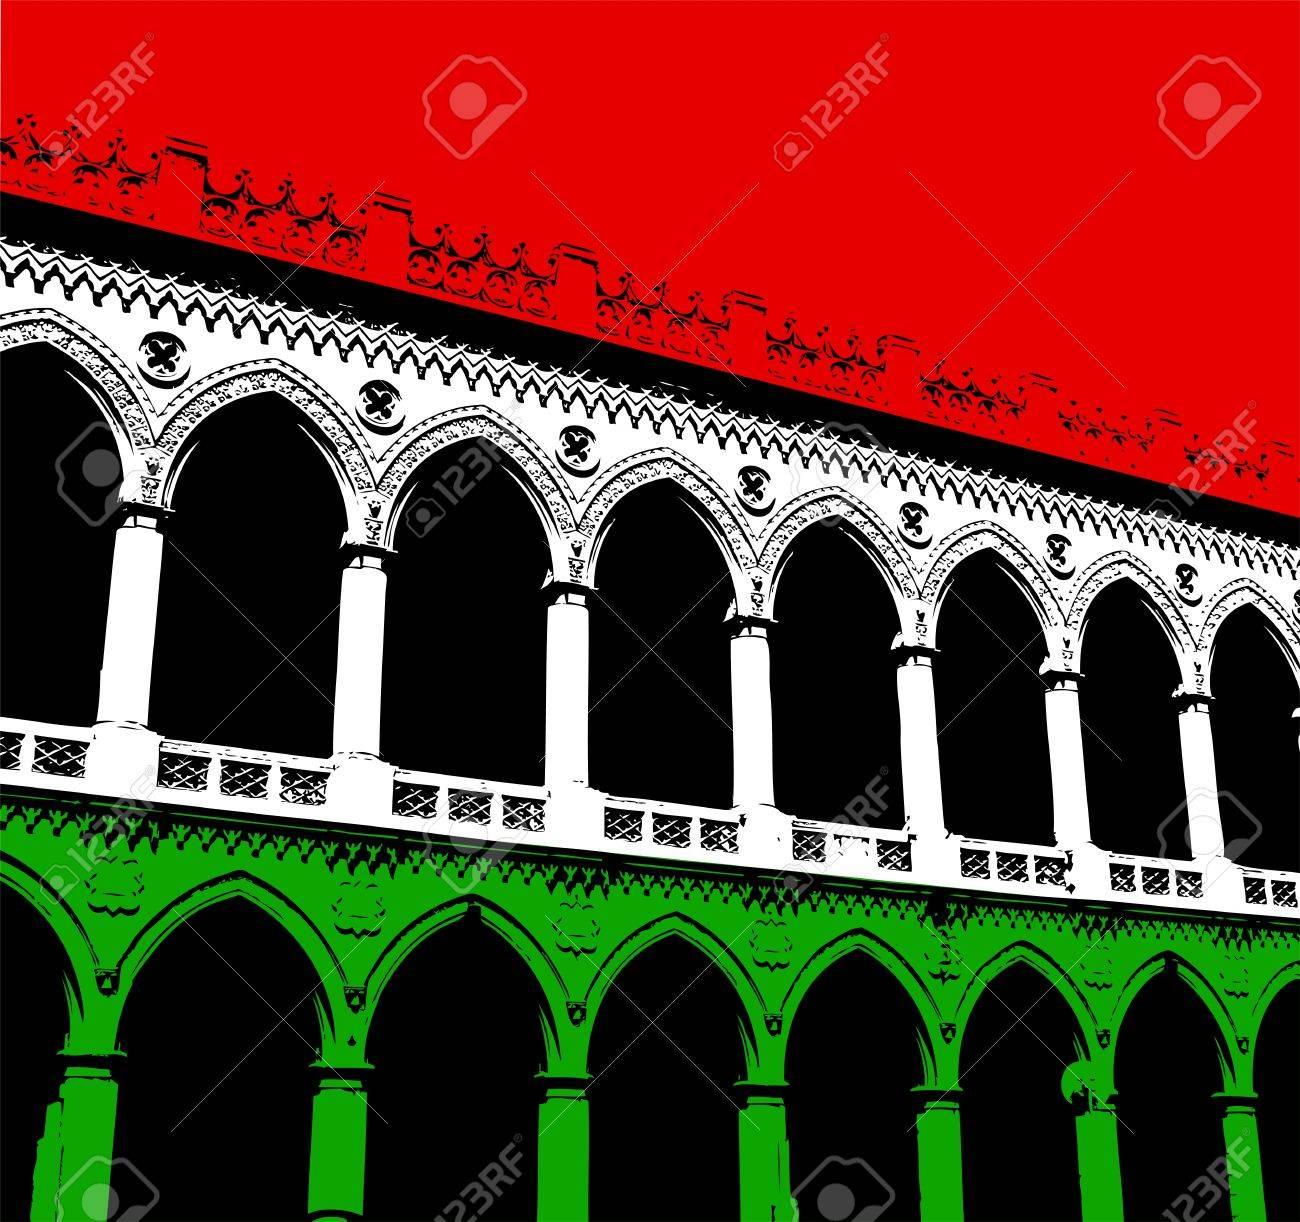 Classical italian arcade Stock Photo - 17007373